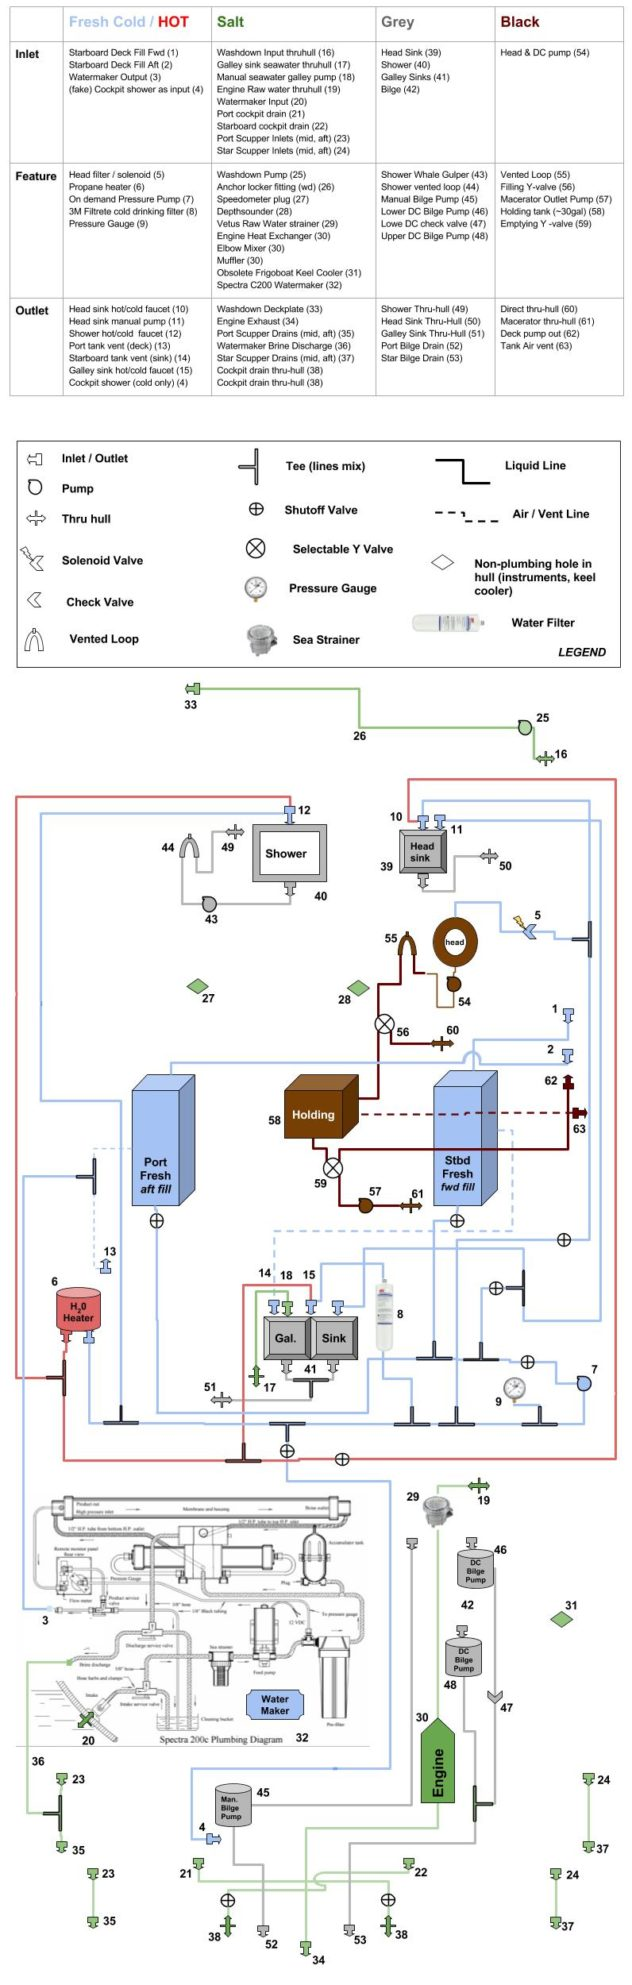 SV Untangled Plumbing Diagram (fresh, salt, grey, black) (1)